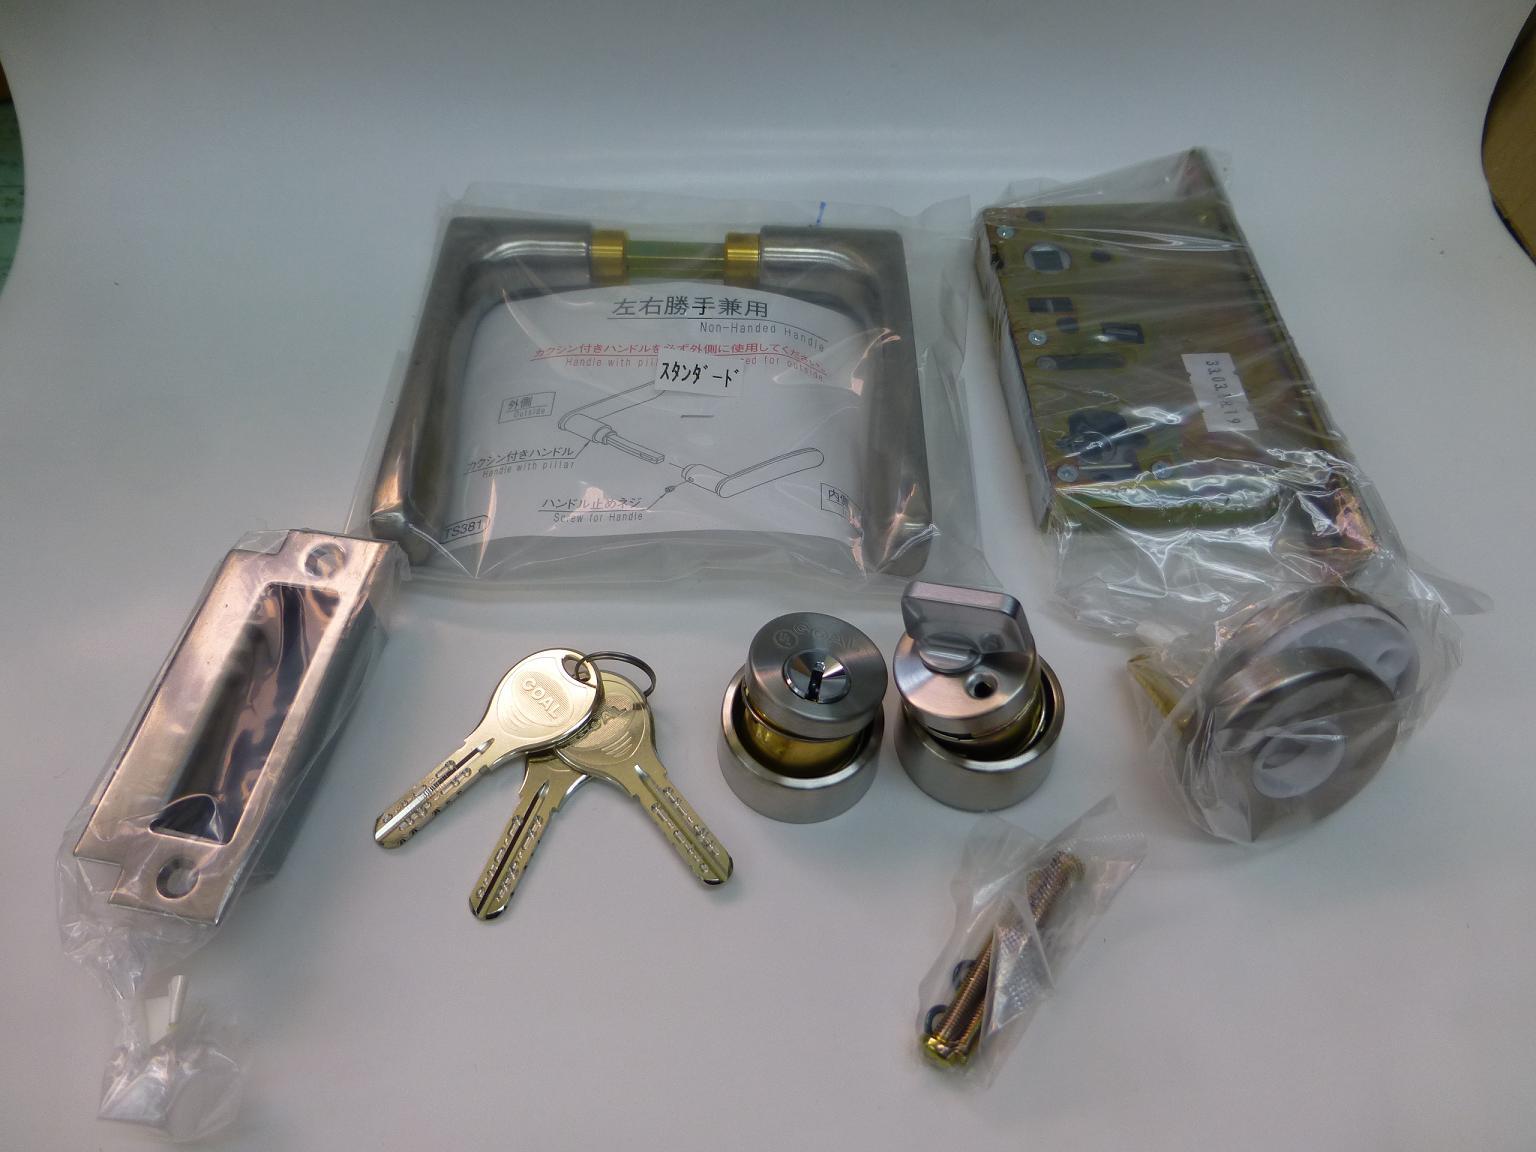 GOAL 本締錠 V-LX5 NU 11S 33~43mm B/S64mm